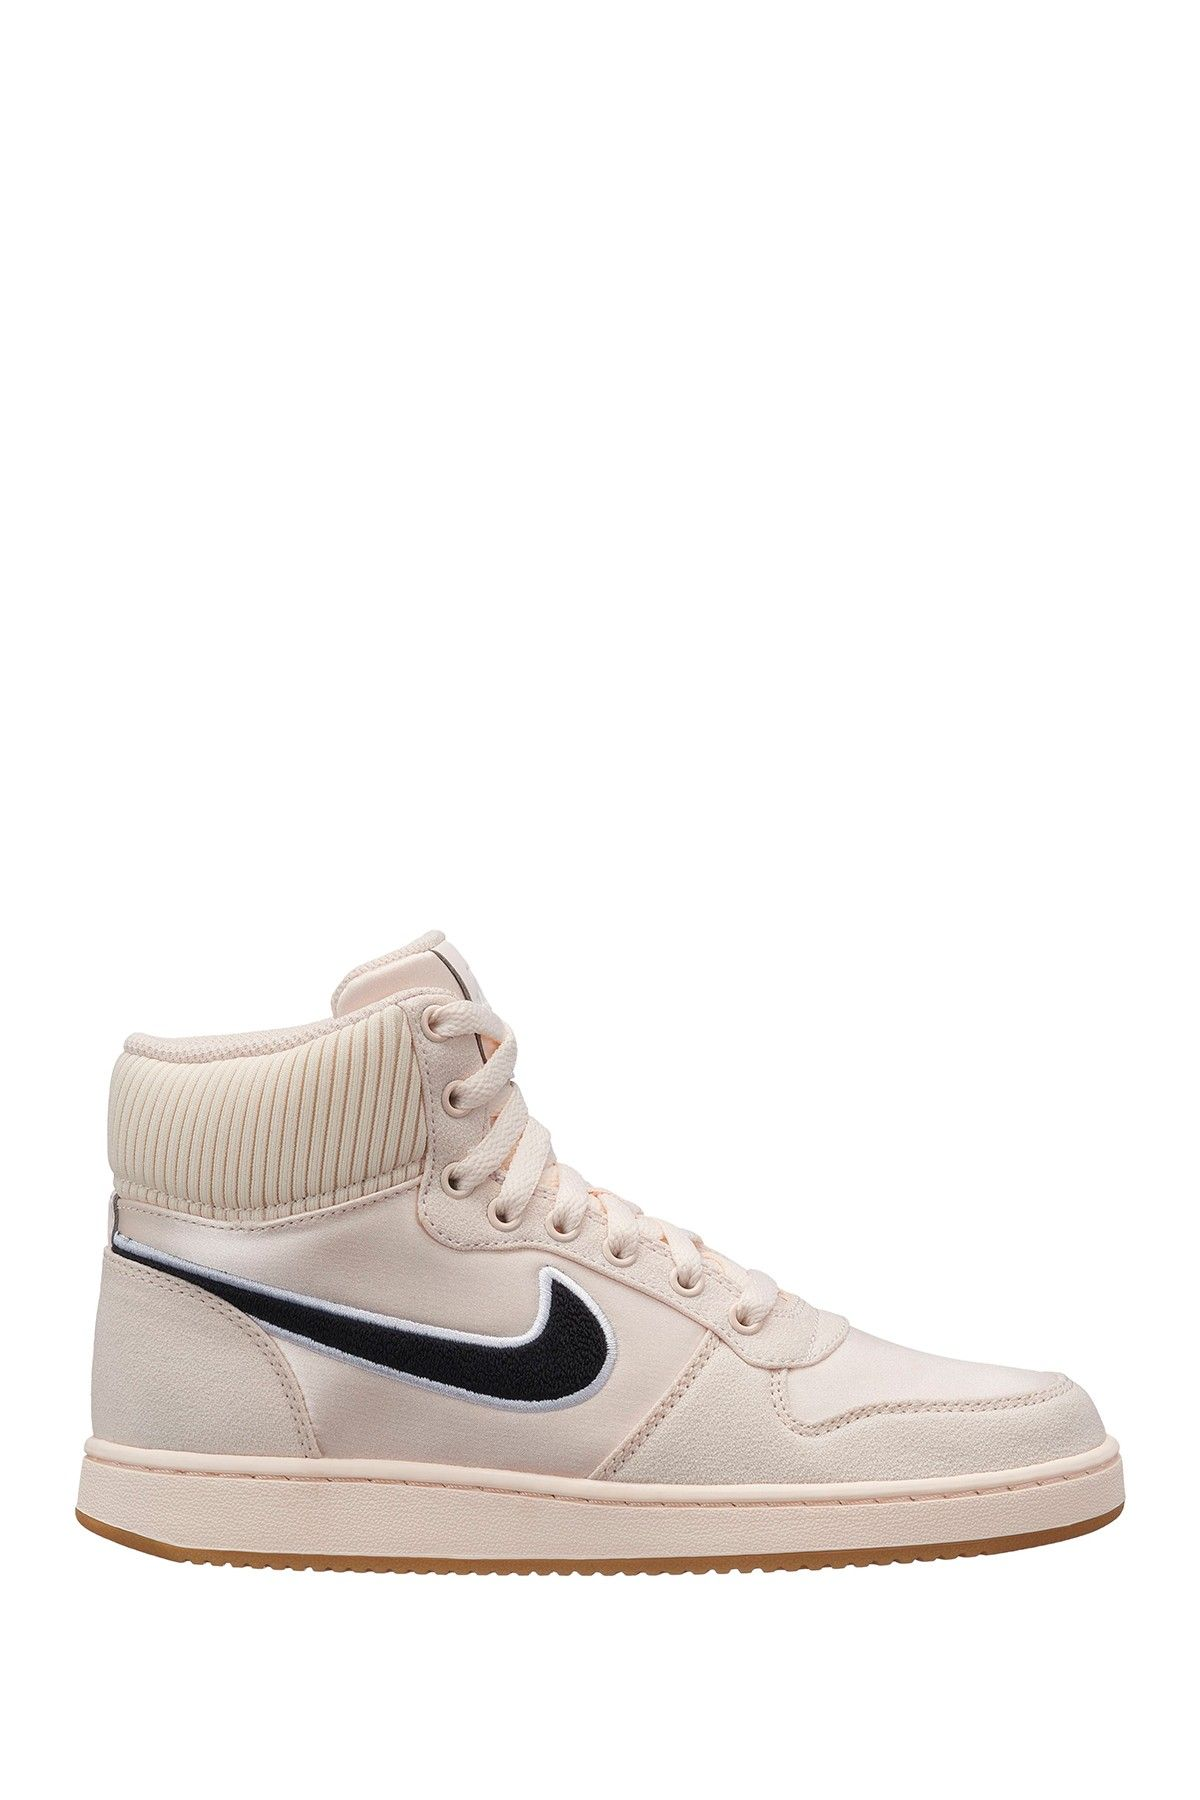 c22751456ea5 Ebernon High Top Sneaker by Nike on  nordstrom rack